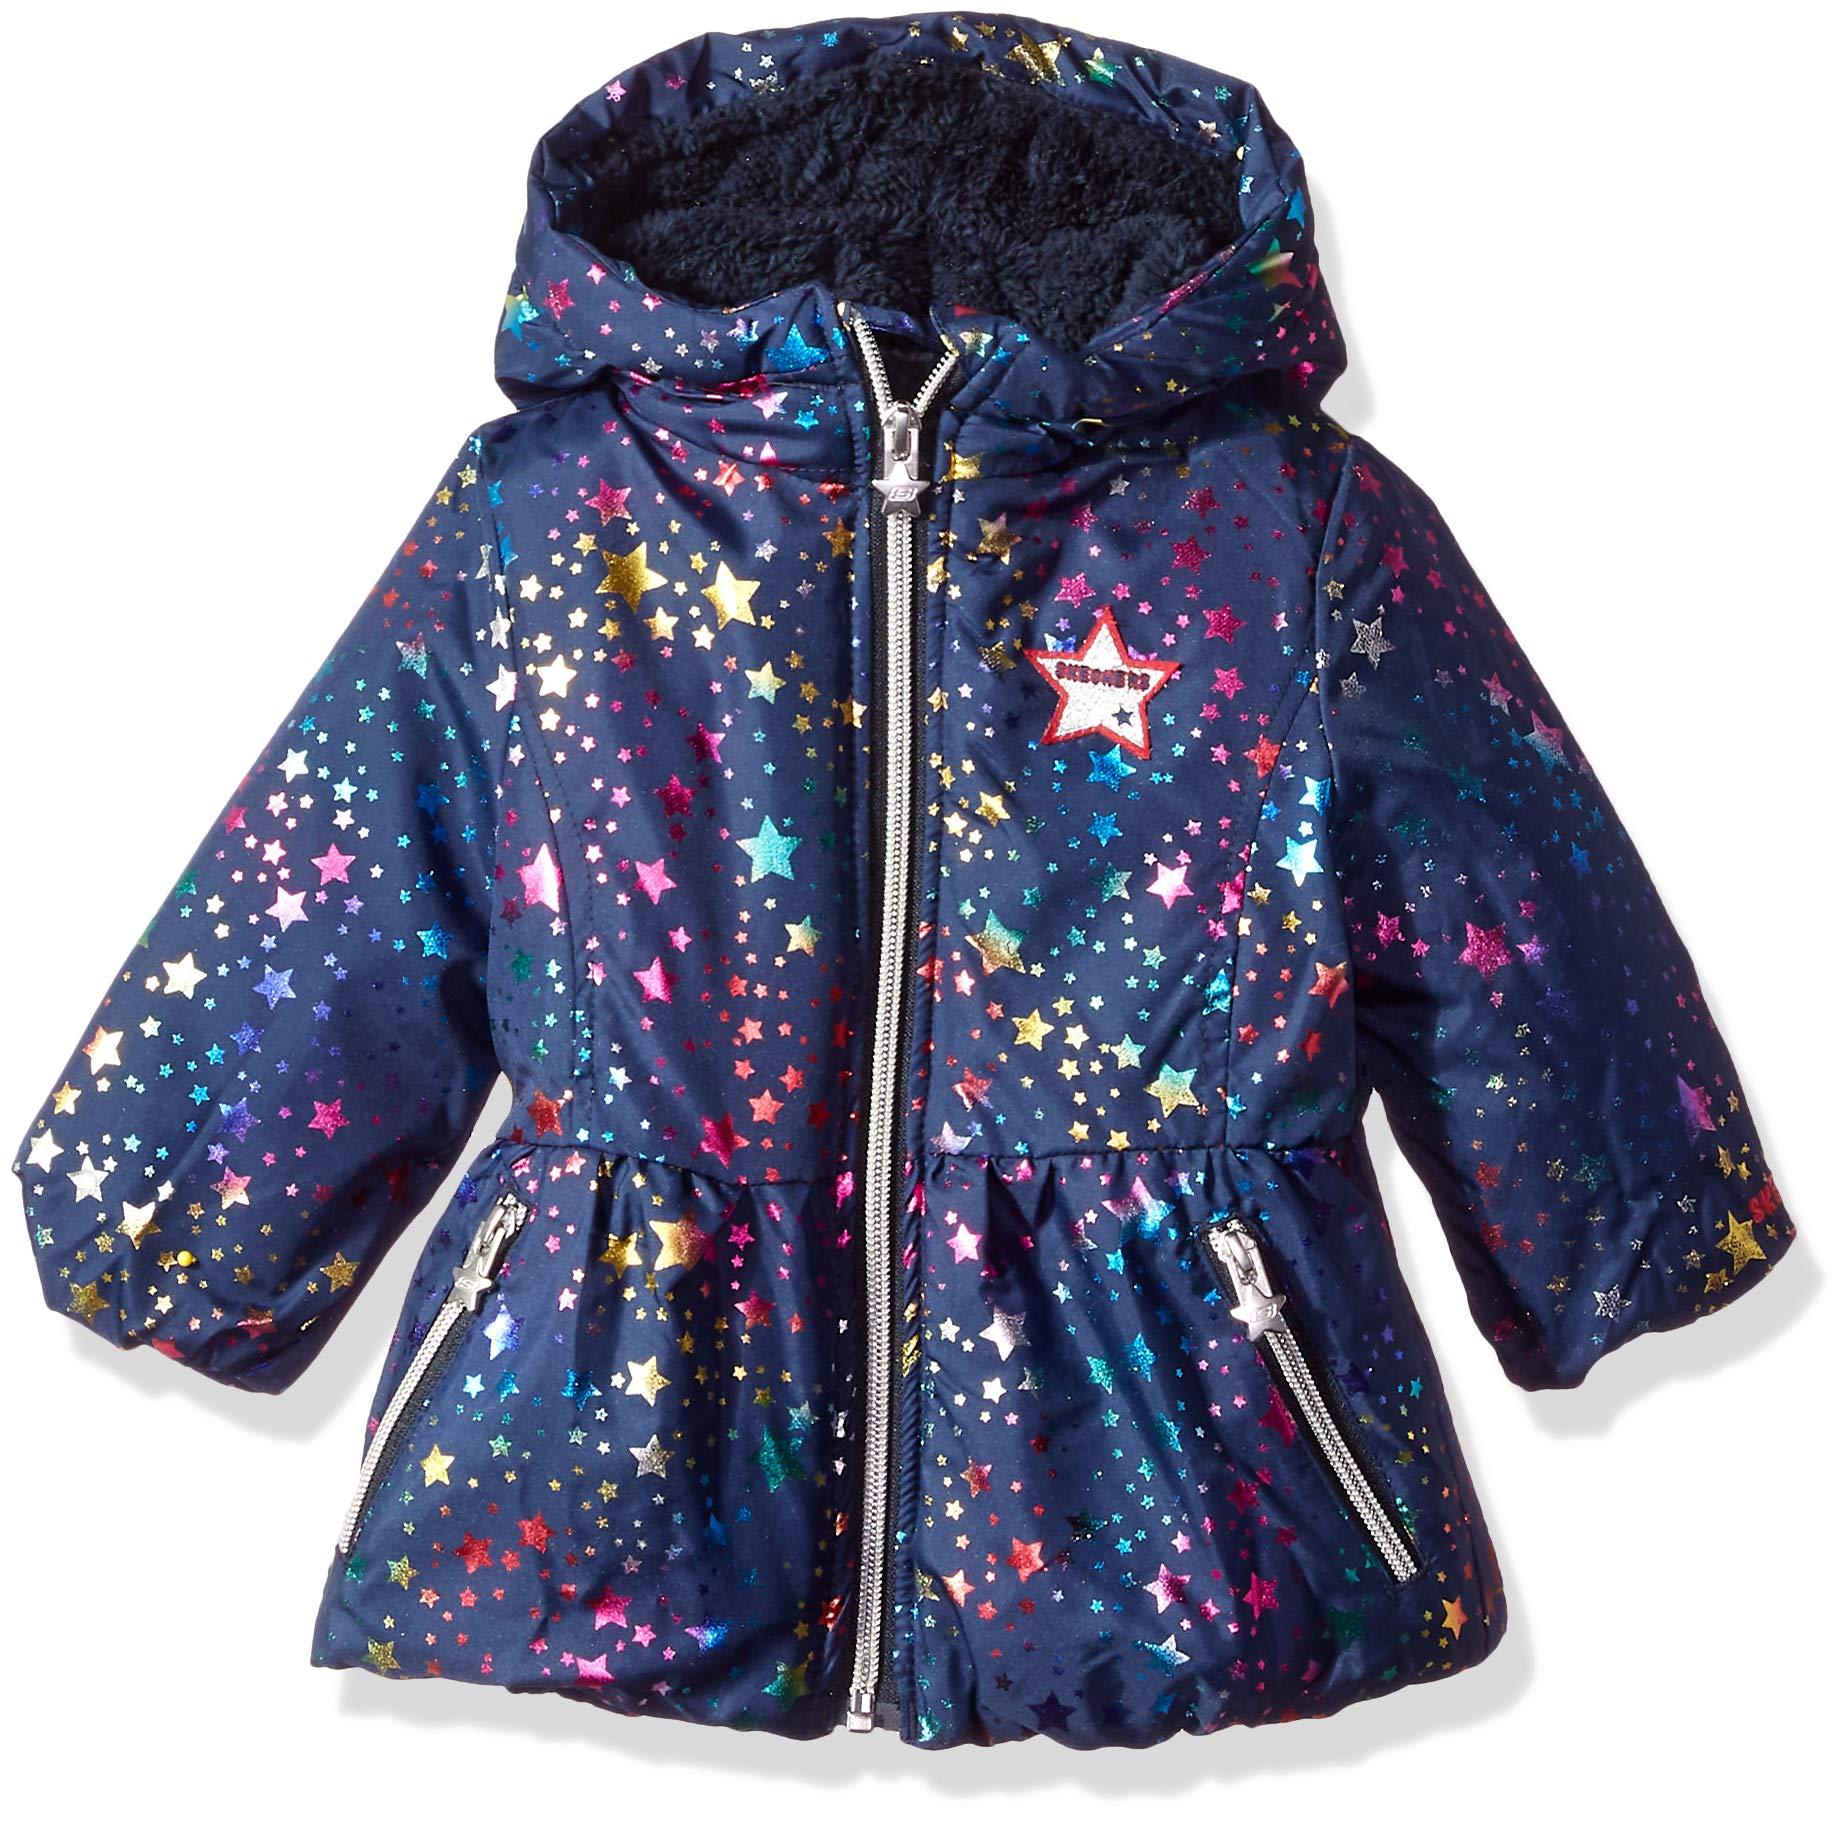 Skechers Baby Girls Heavyweight Warm Jacket, Rainbow Stars, 24M by Skechers